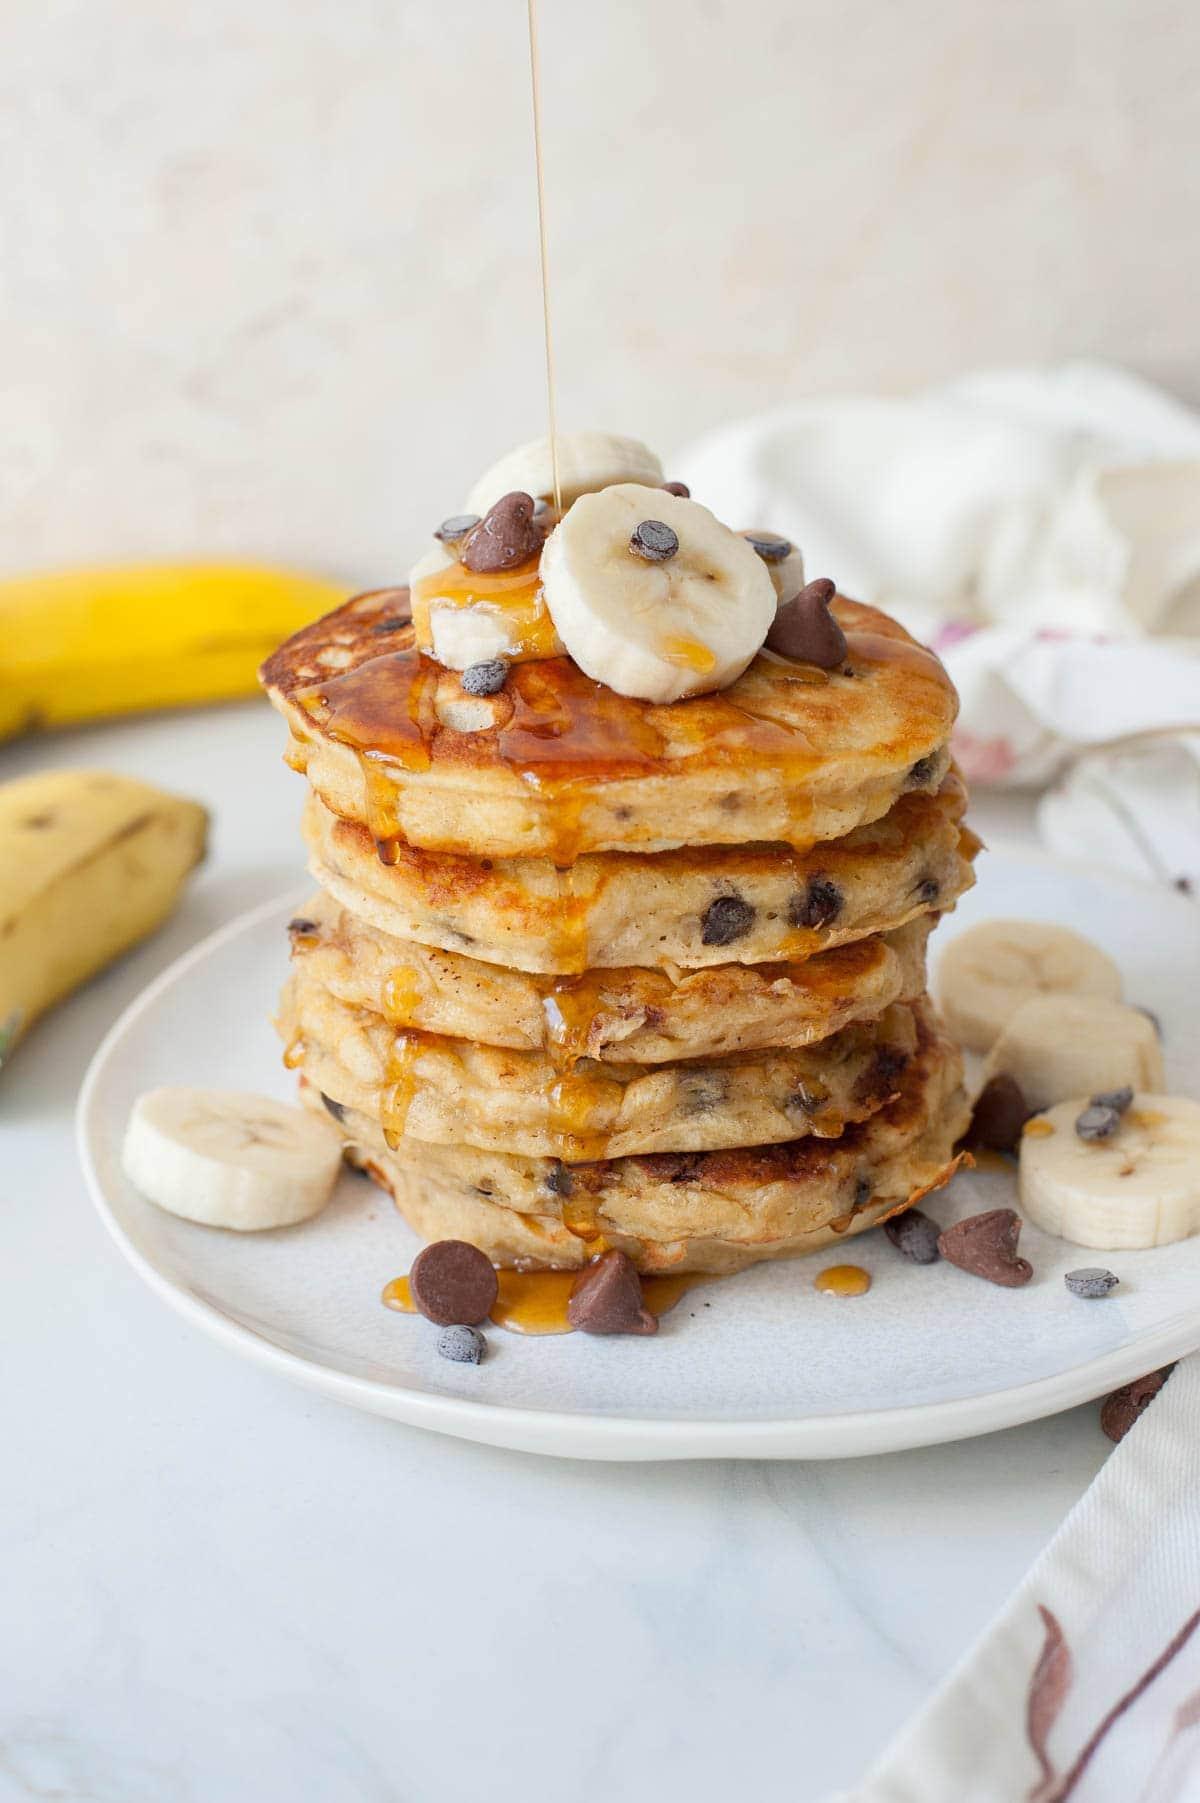 Banana Chocolate Chip Pancakes Everyday Delicious